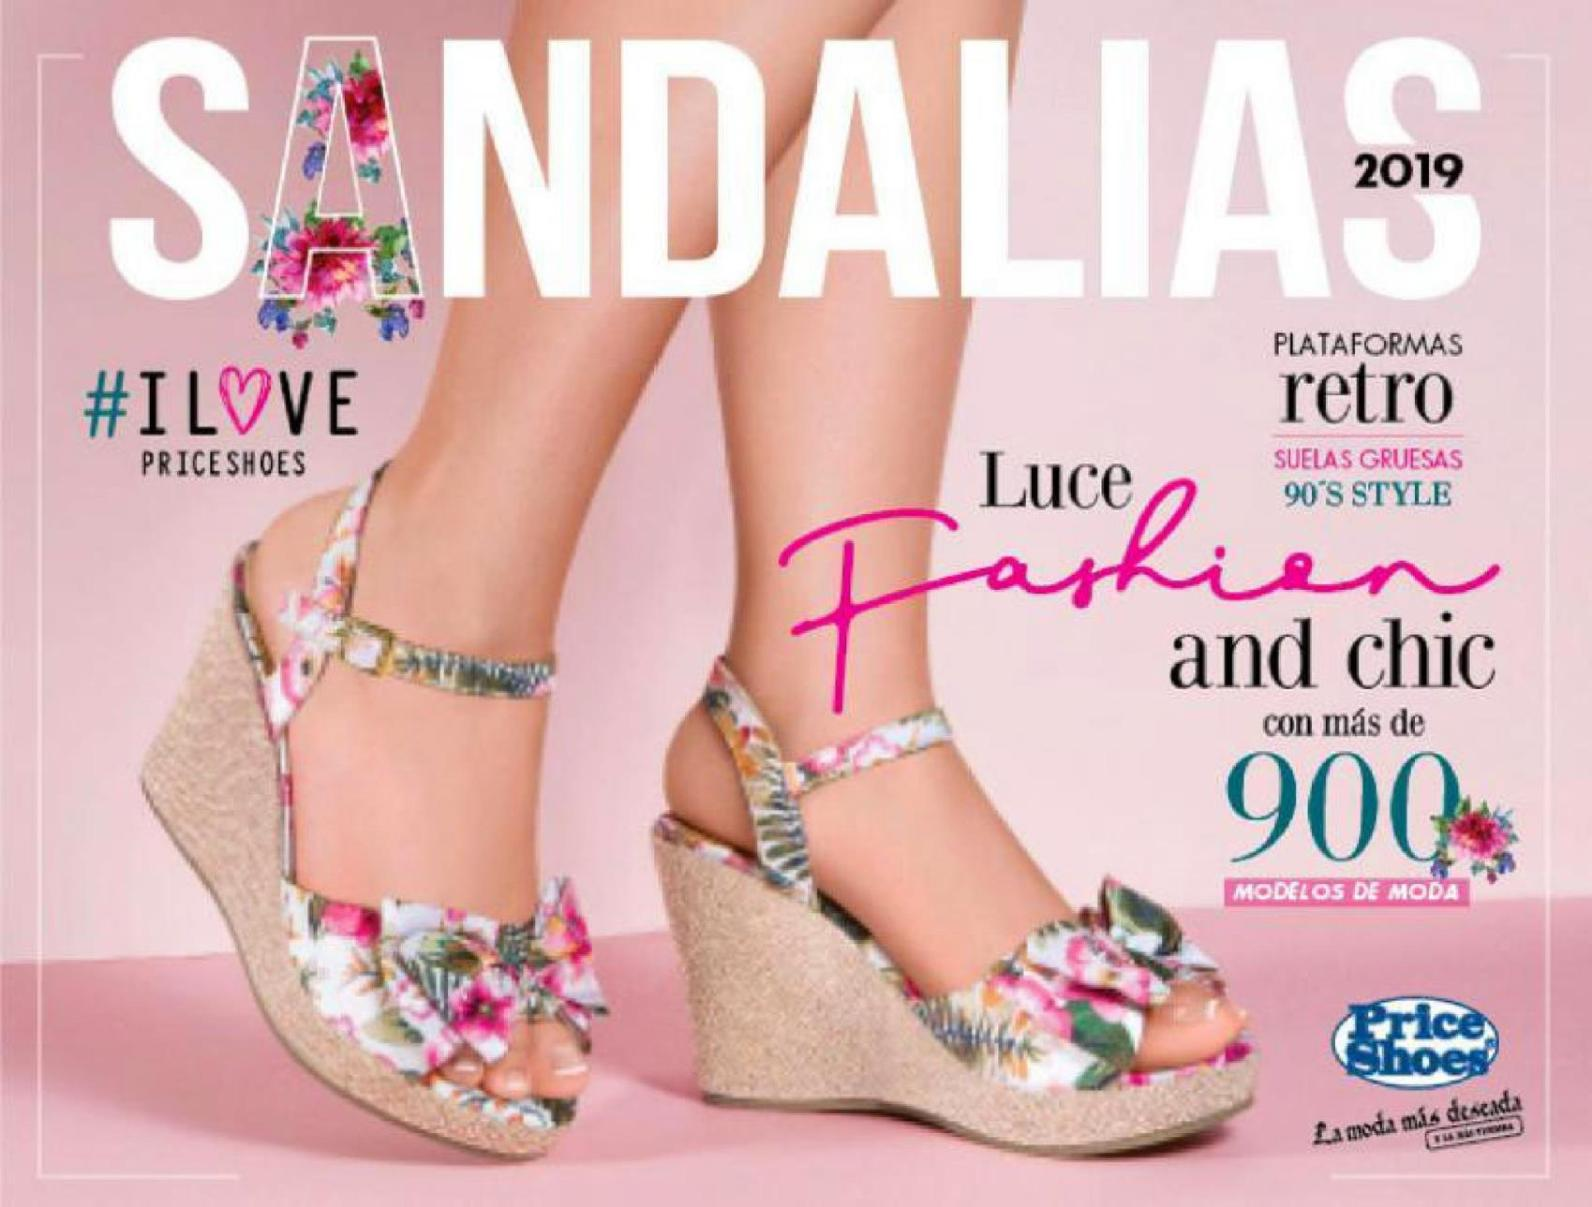 Price Shoes - 2020/03/10 - Catálogo Price Shoes